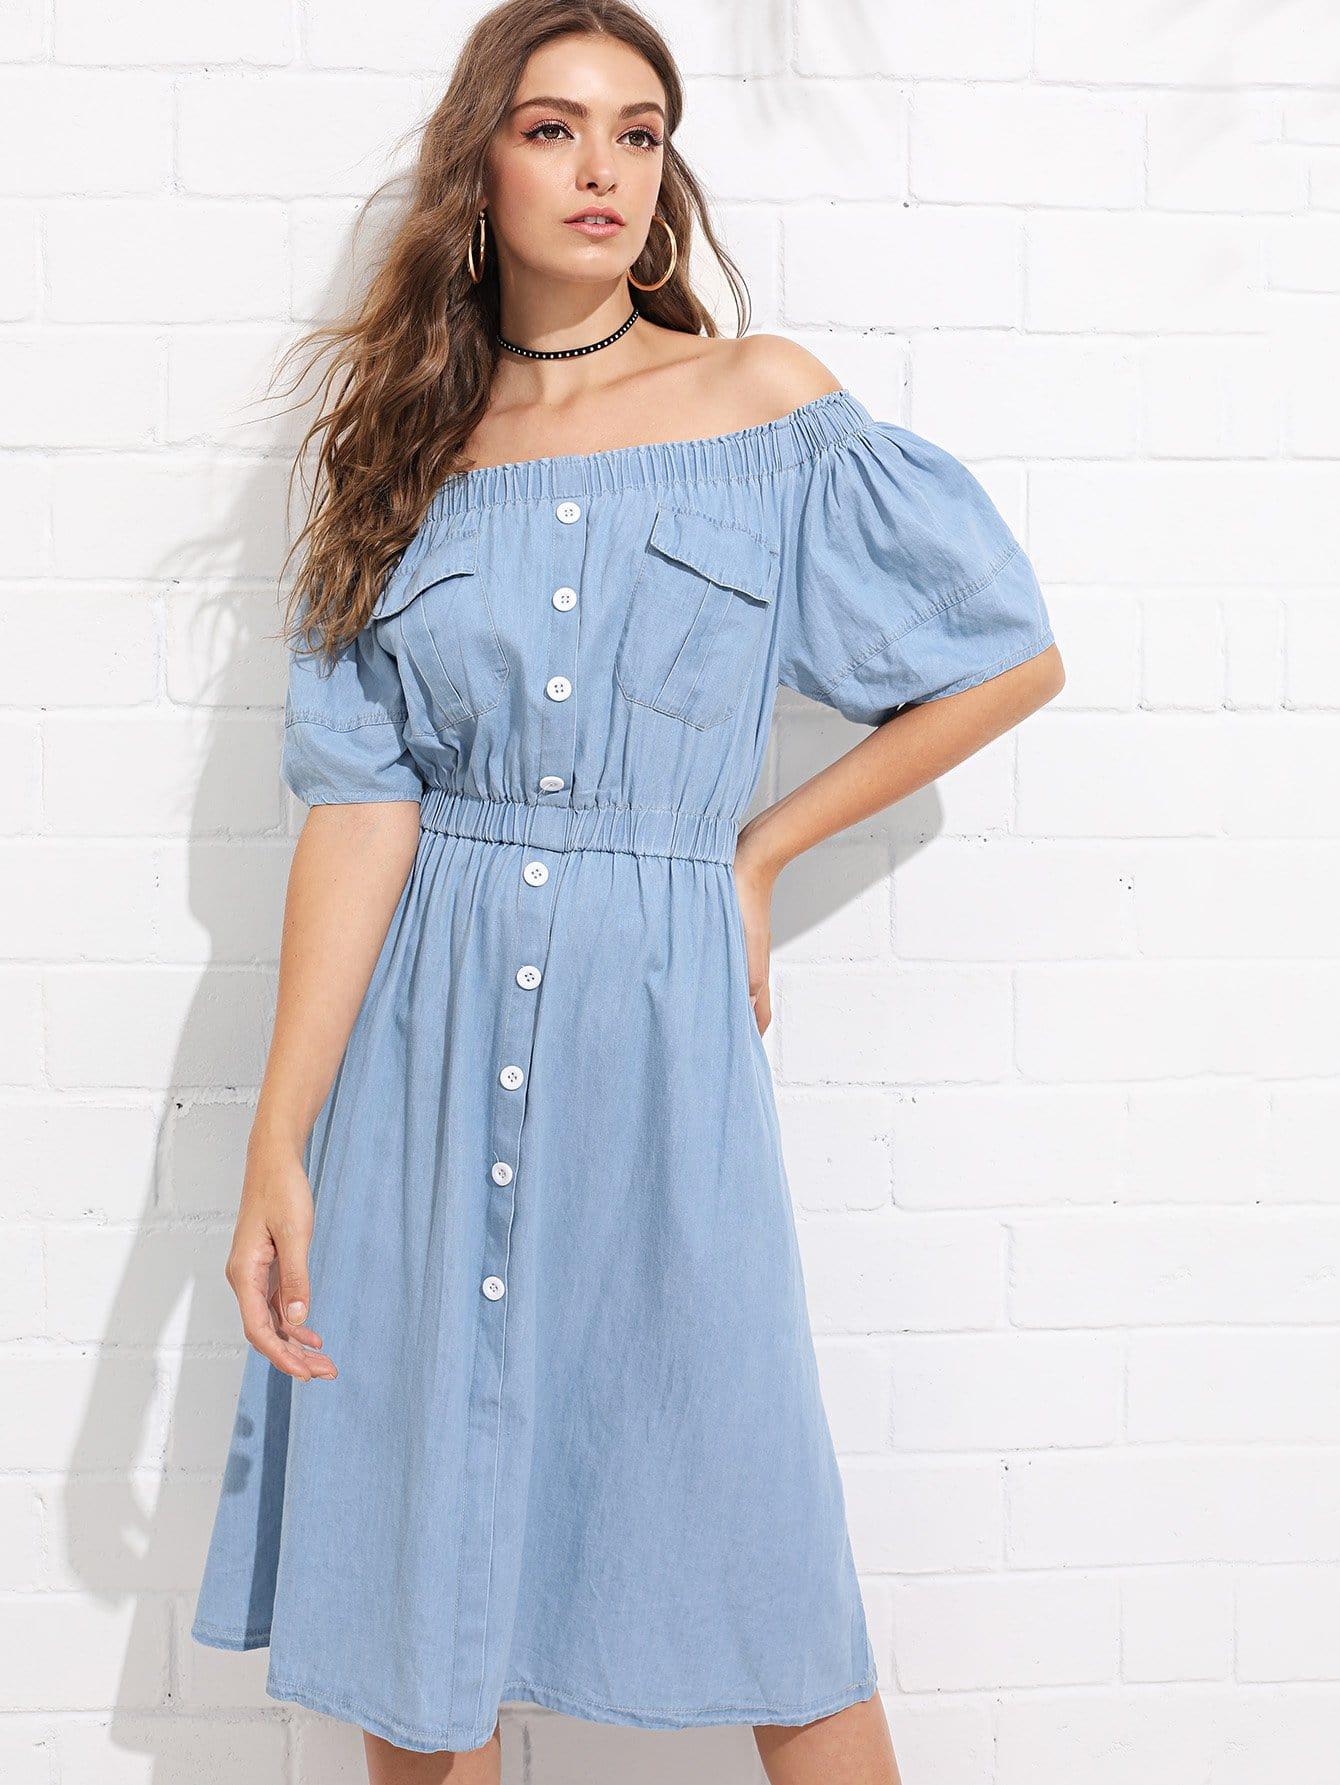 Off-Shoulder Button Front Elastic Waist Denim Dress elastic waist button denim dress